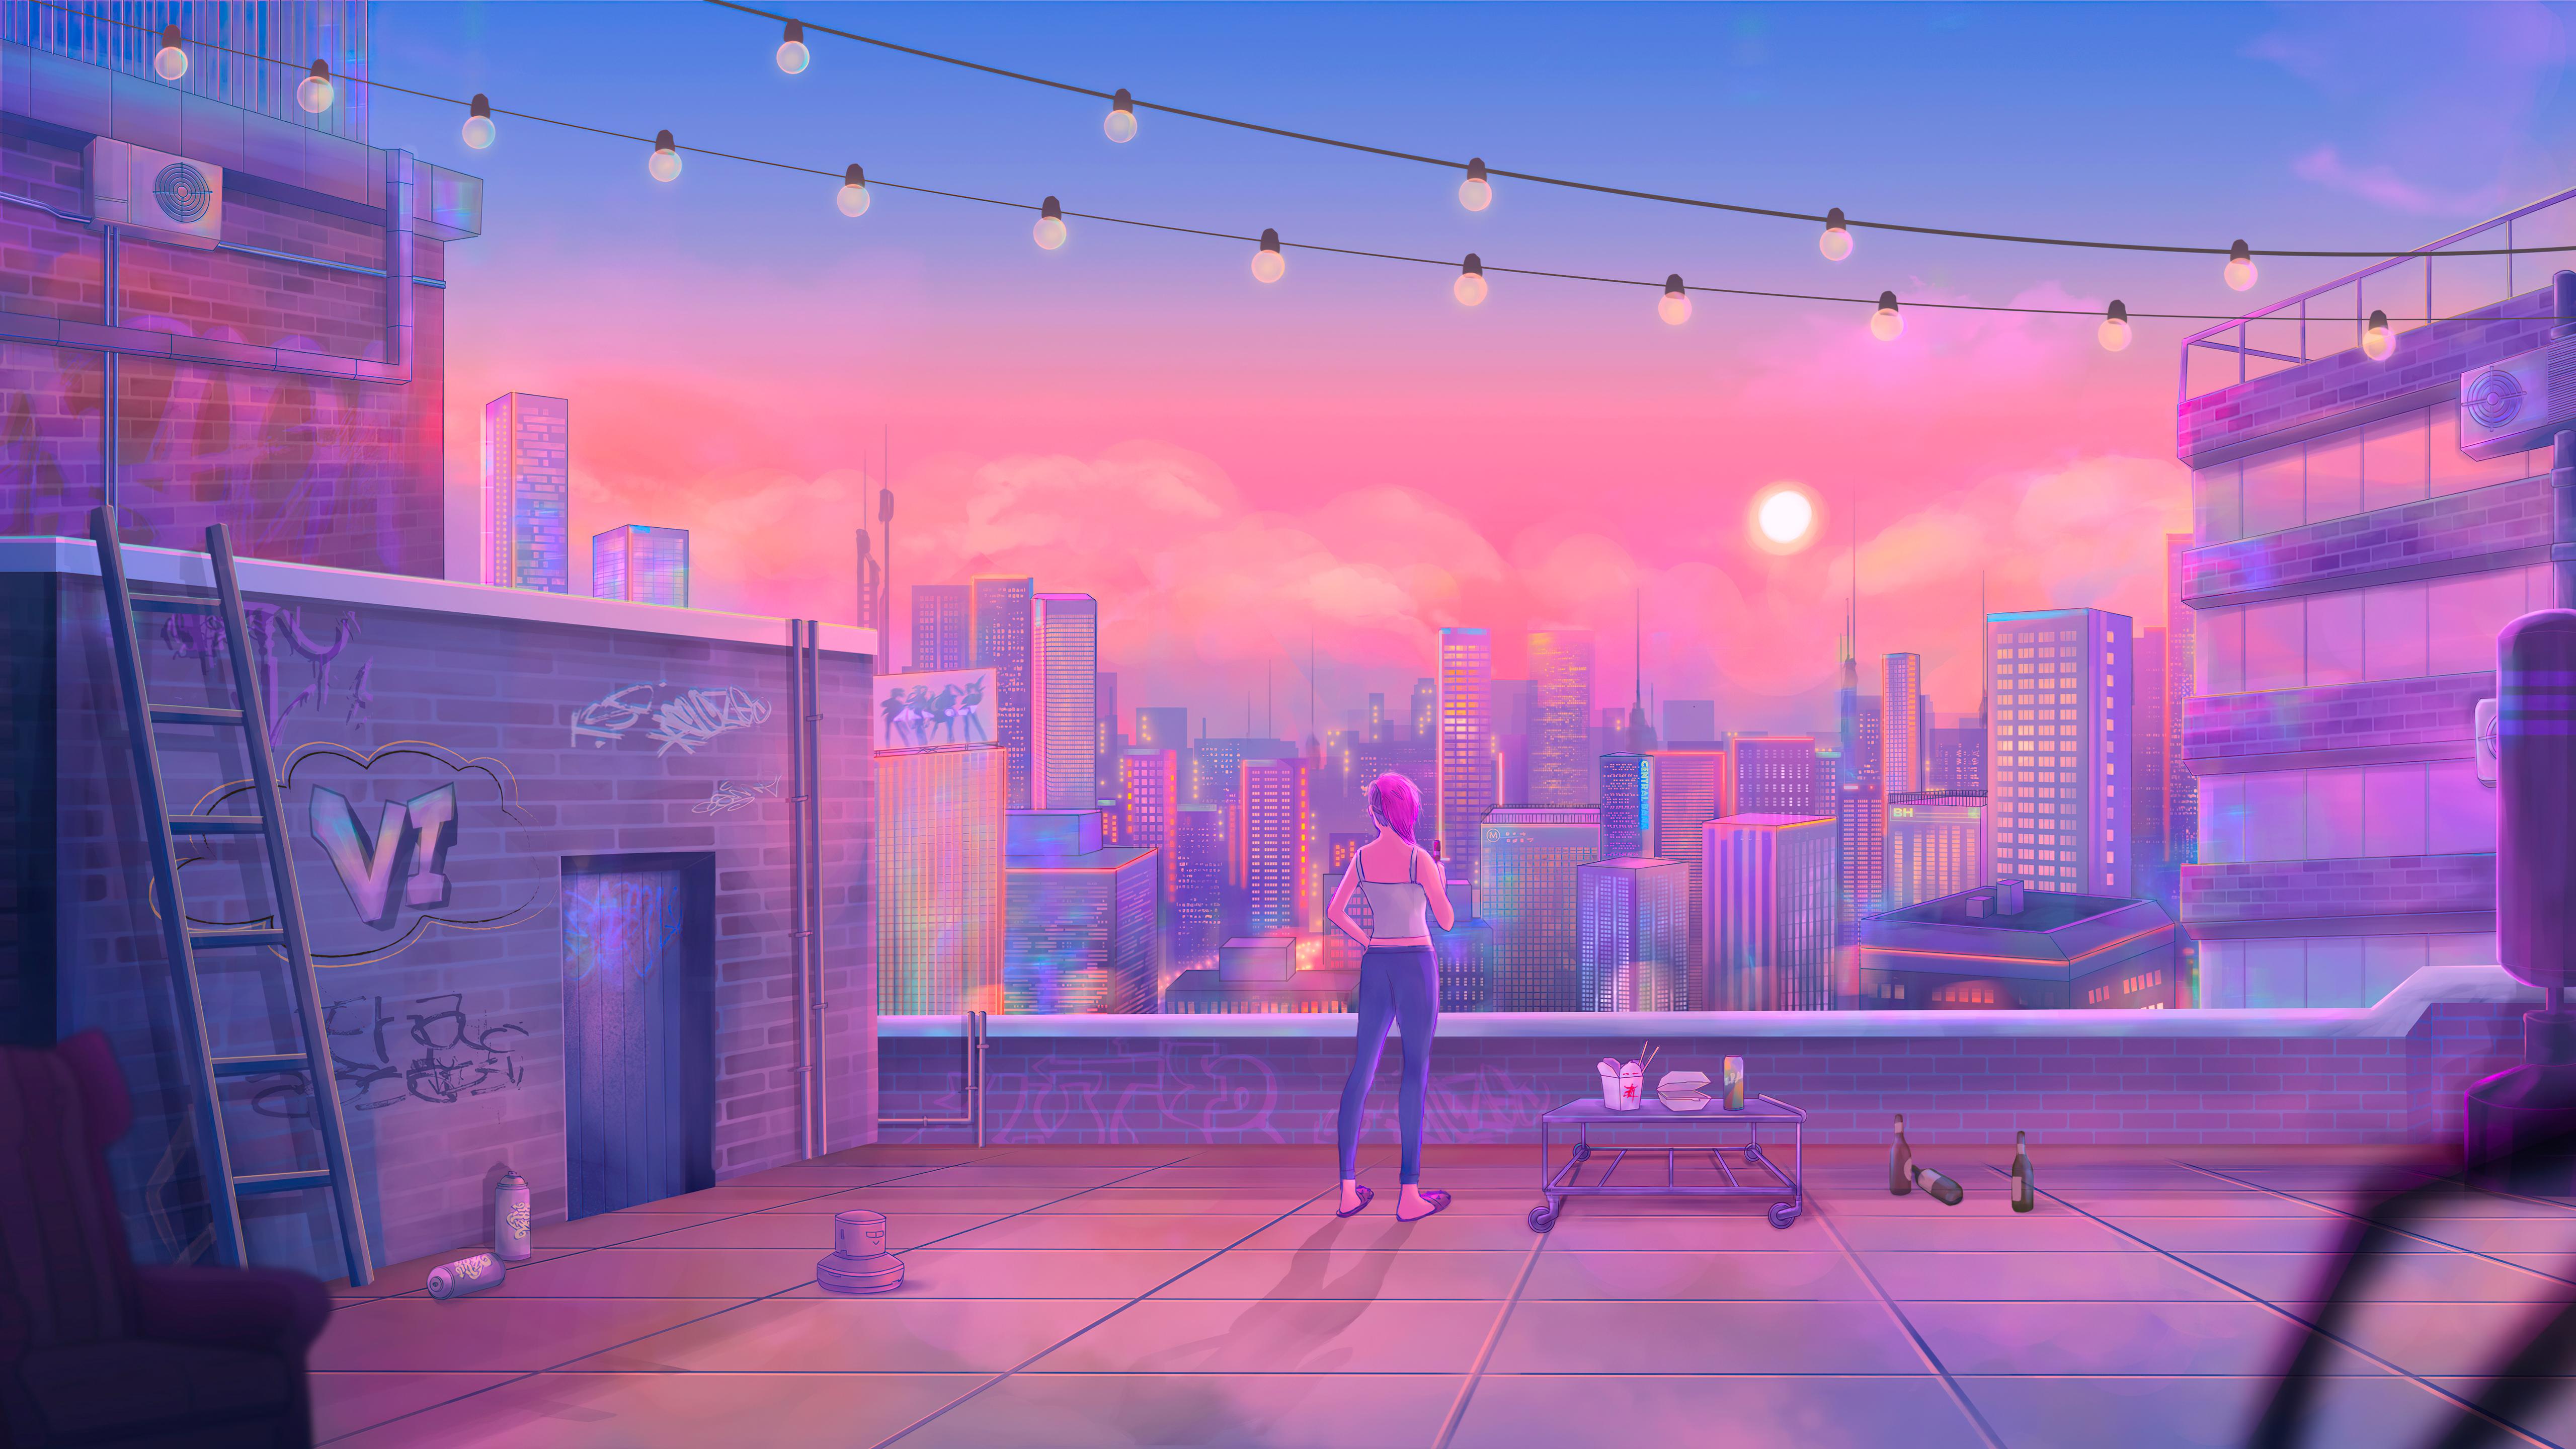 Artistic City 5120x2880